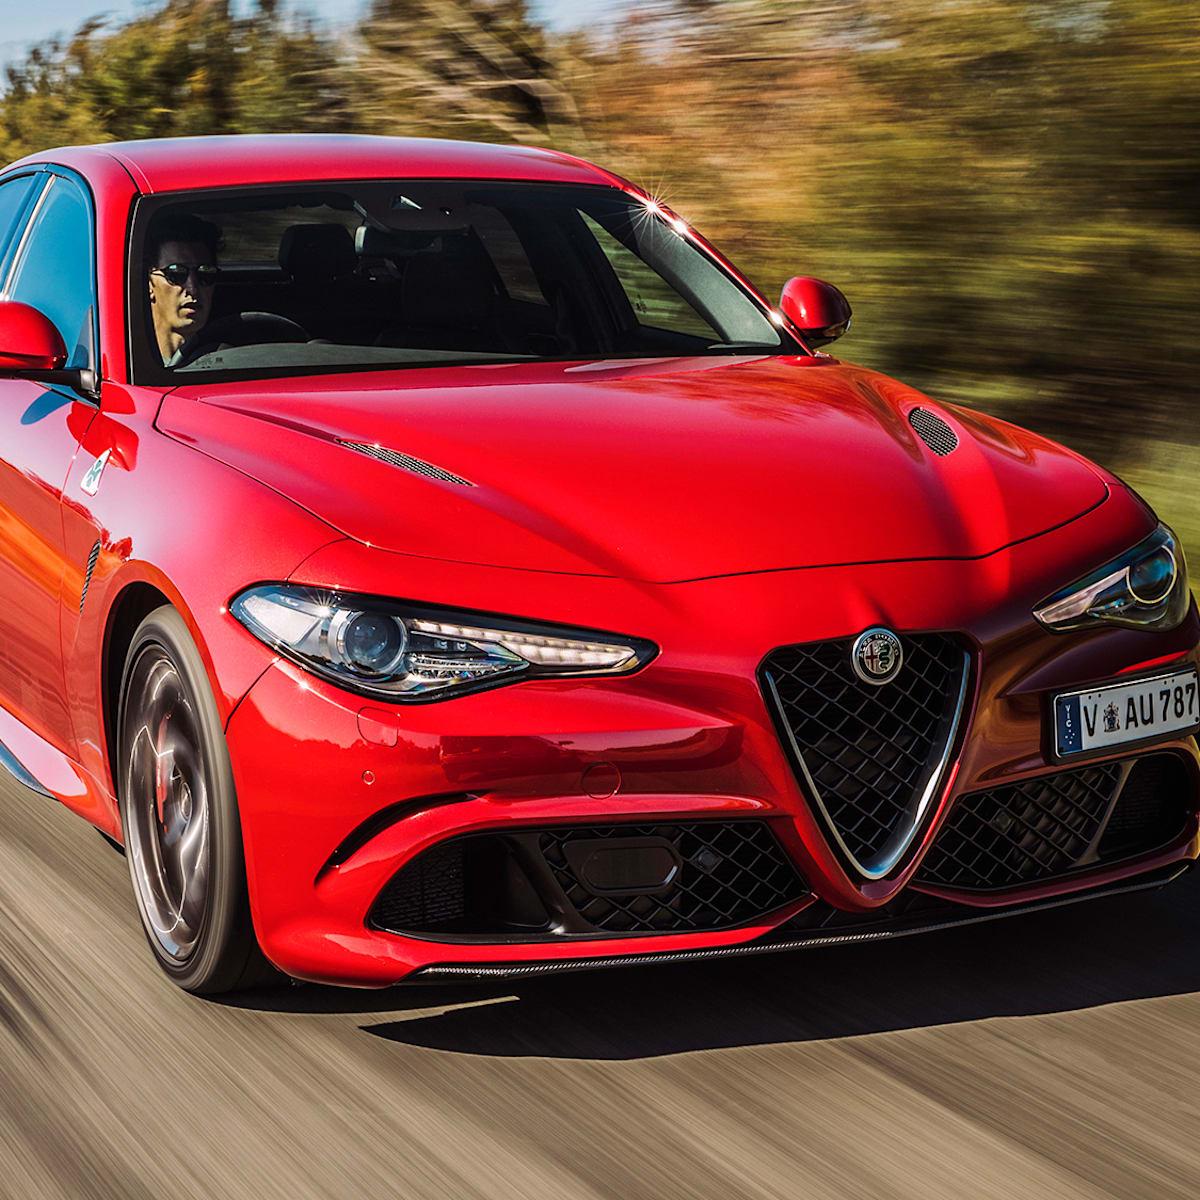 How Much Is An Alfa Romeo >> 2019 Alfa Romeo Giulia Pricing And Specs Caradvice